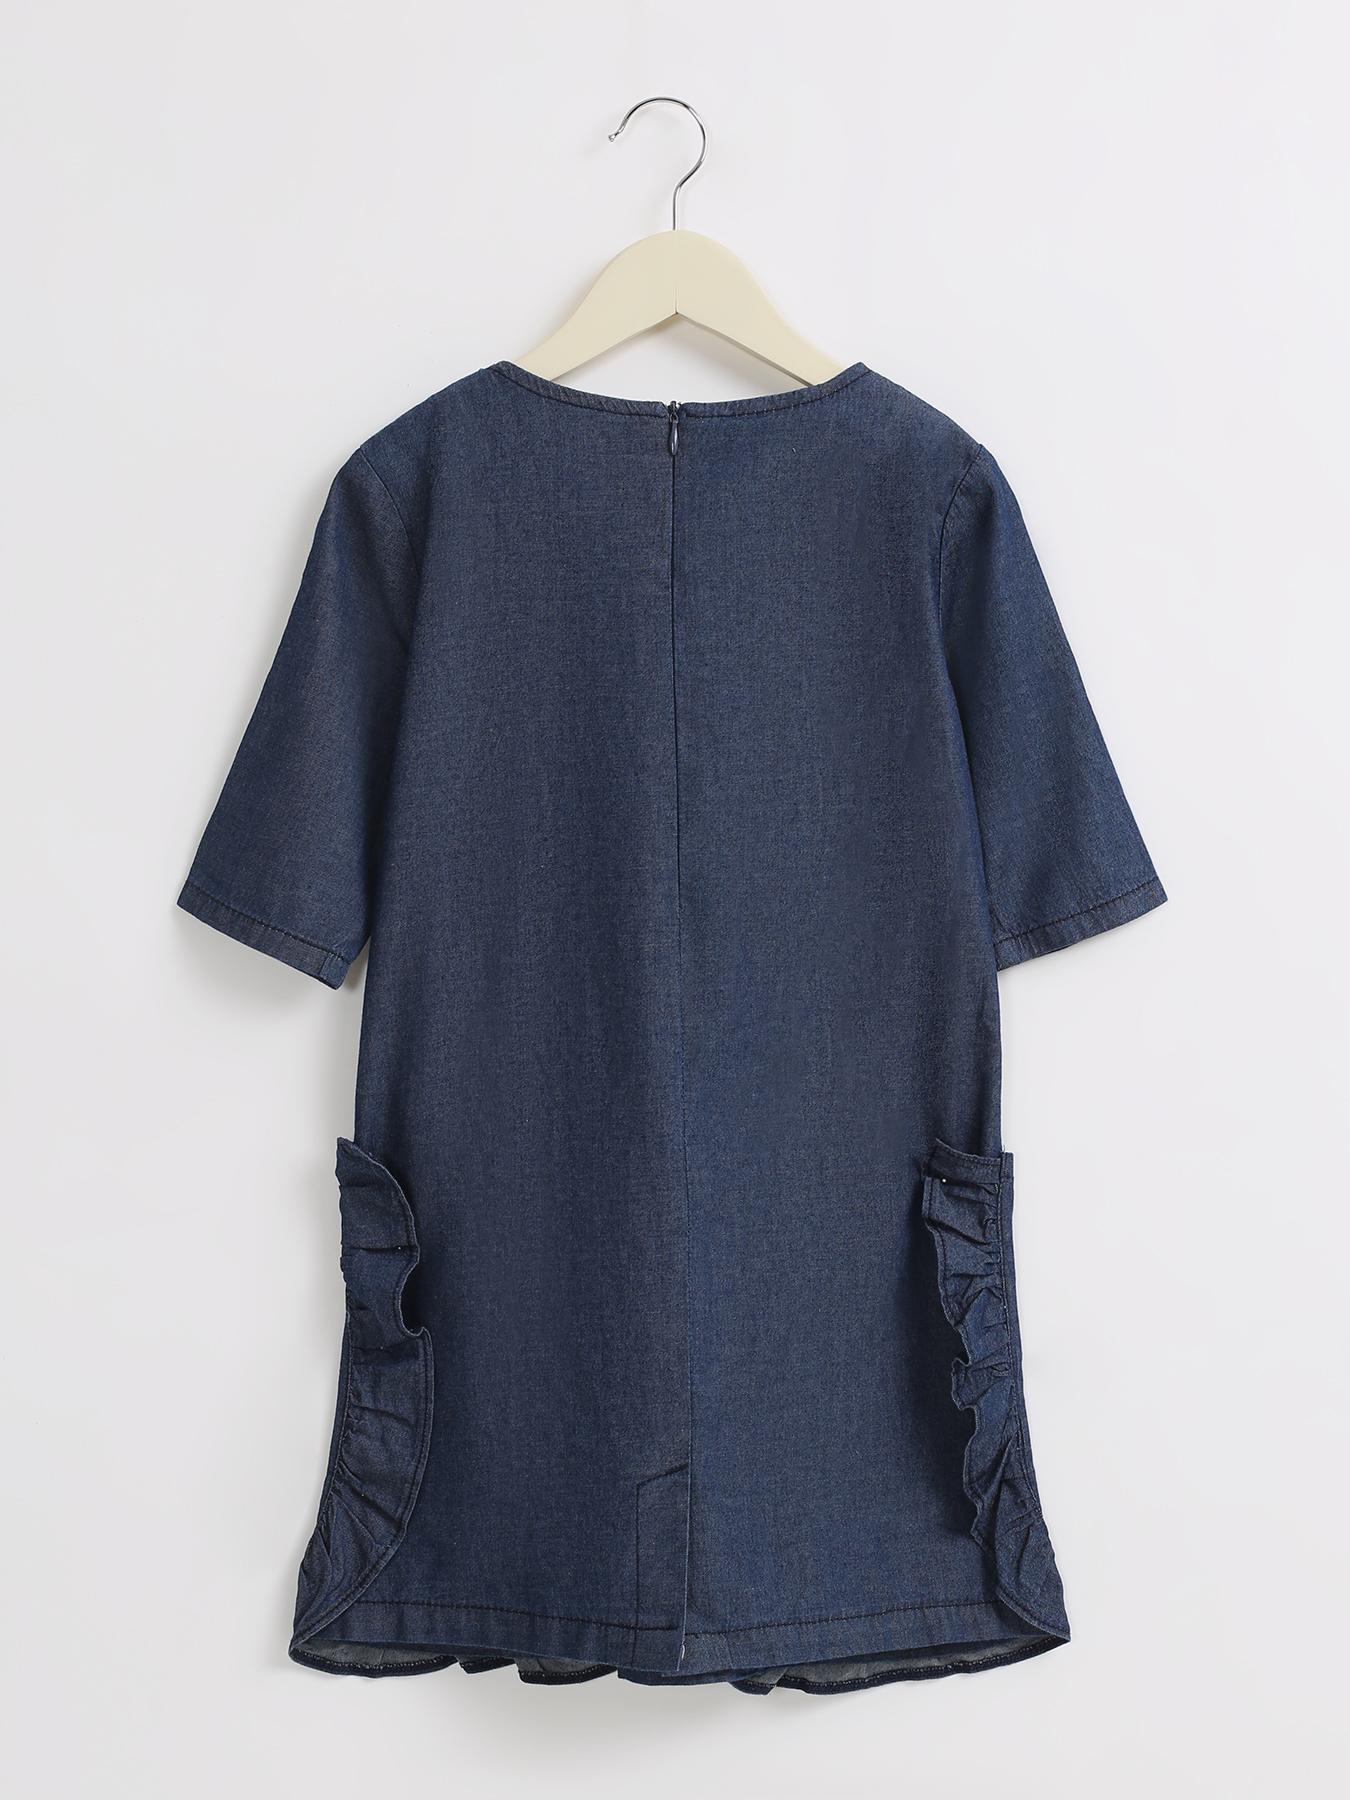 Платье Finisterre Платье с большими карманами свободное платье с 2 мя карманами yarmina